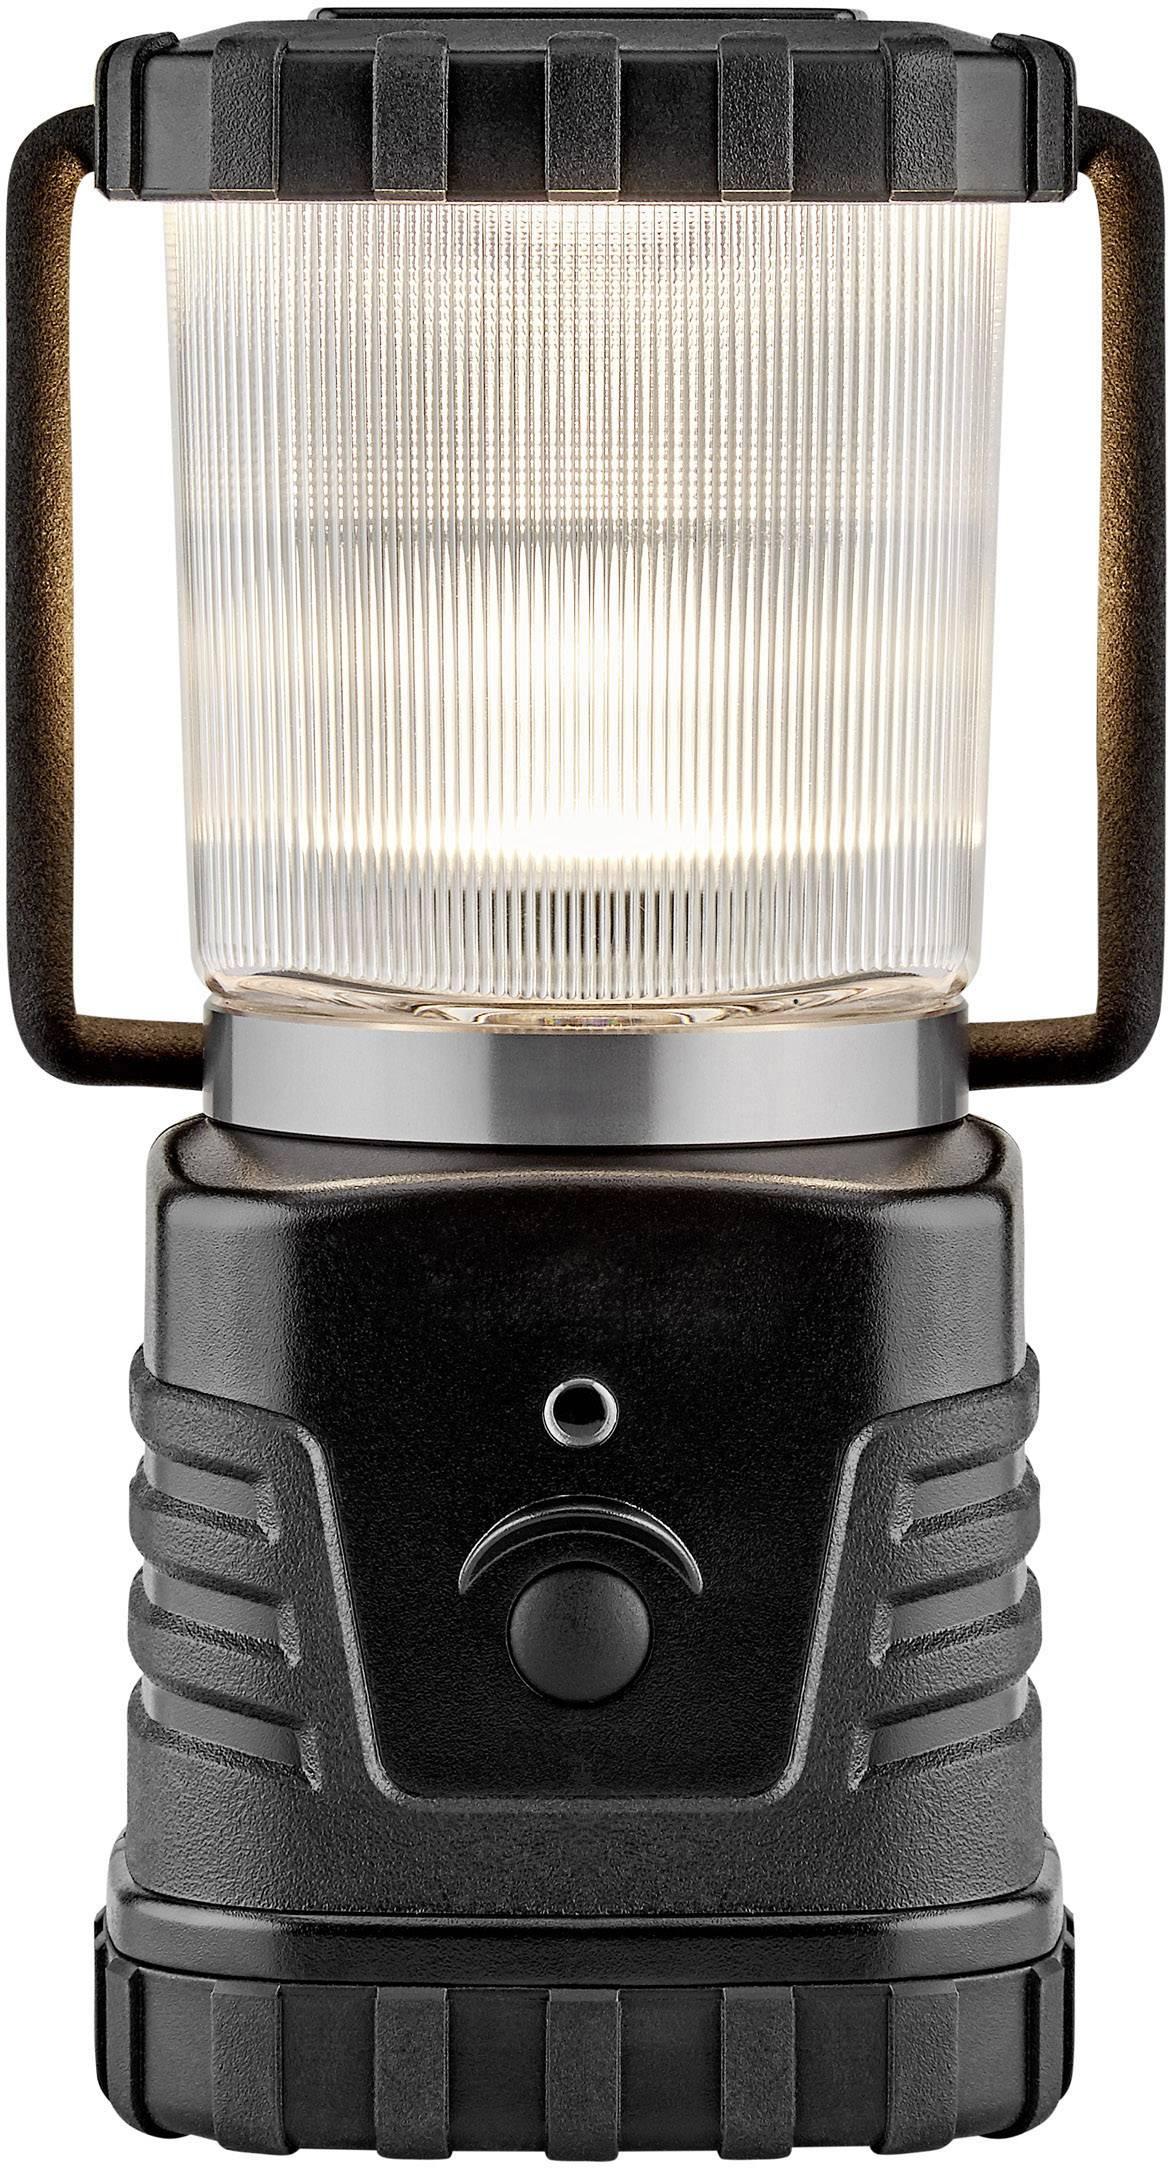 LED kempingová lucerna Polarlite Profi 280 817 g, černá